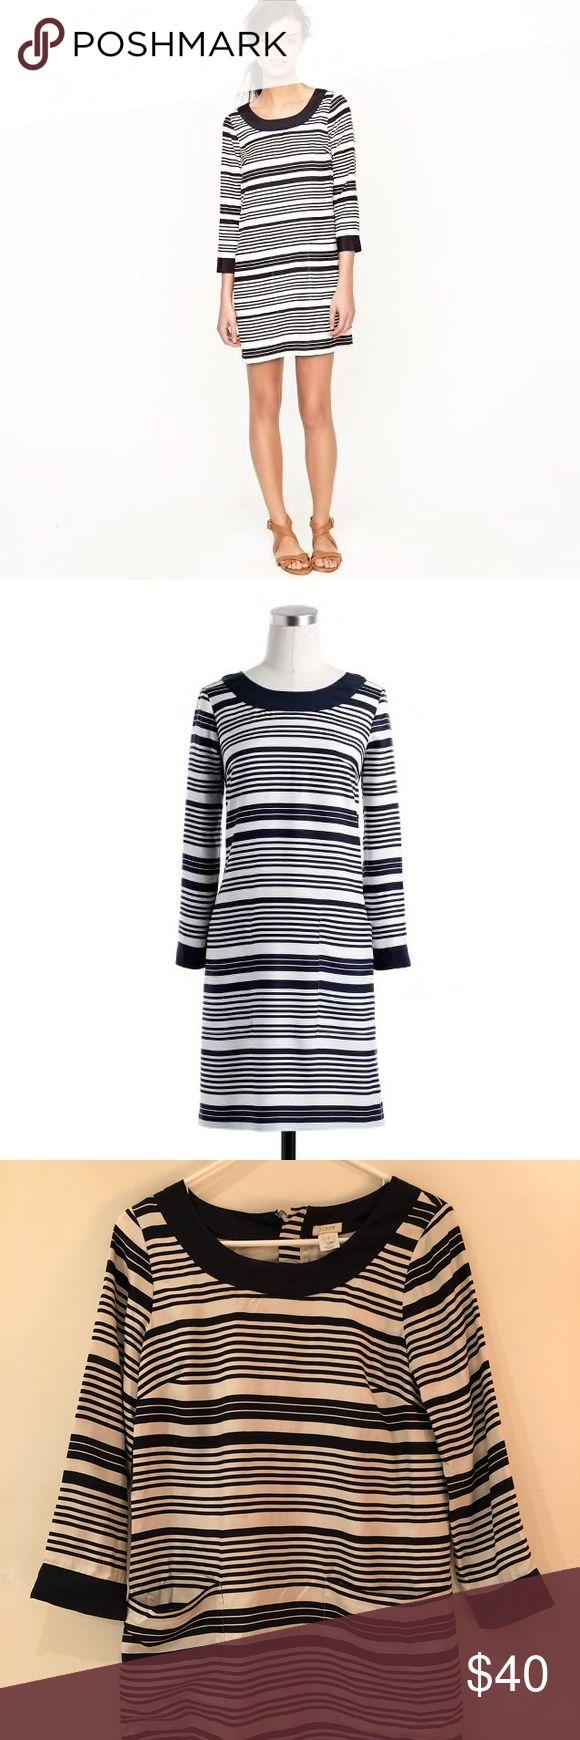 J. Crew Jules dress in silk stripe - Navy White Silk 3/4 Sleeve Striped Cocktail Dress - Deep front pockets - 100% Silk - Polyester lining - Gently worn J. Crew Dresses Mini